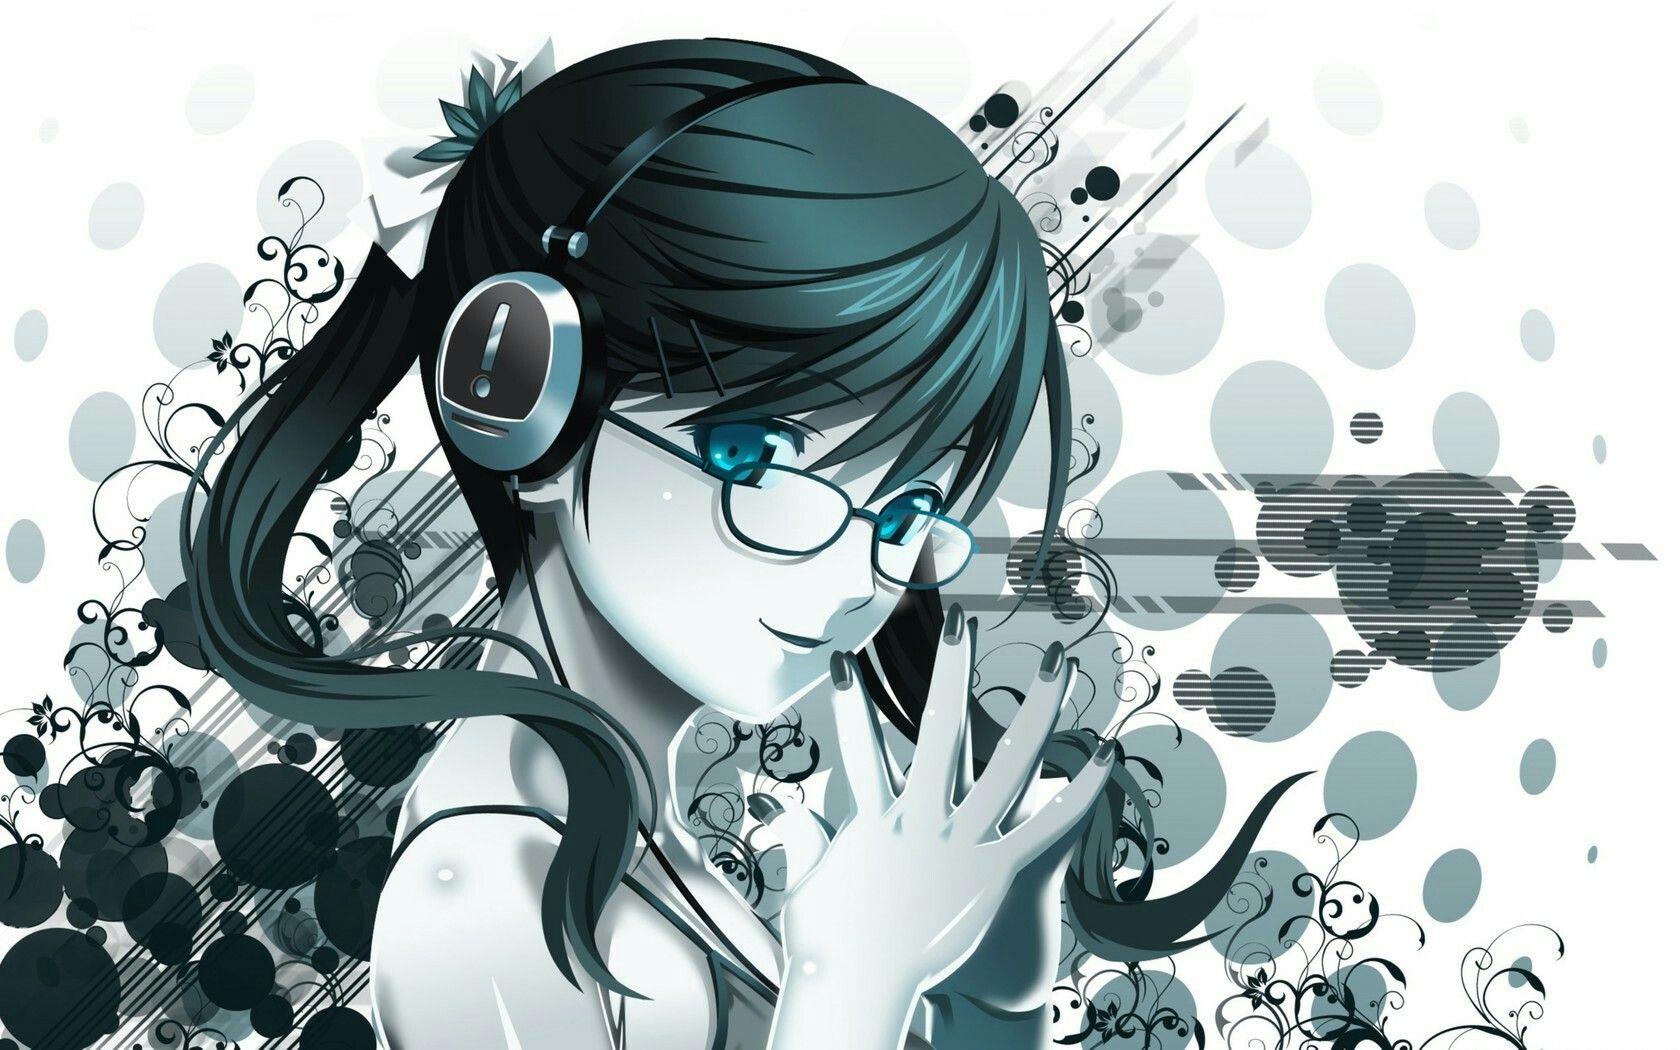 animegirl with glasses and headphones girl with glasses rh pinterest com